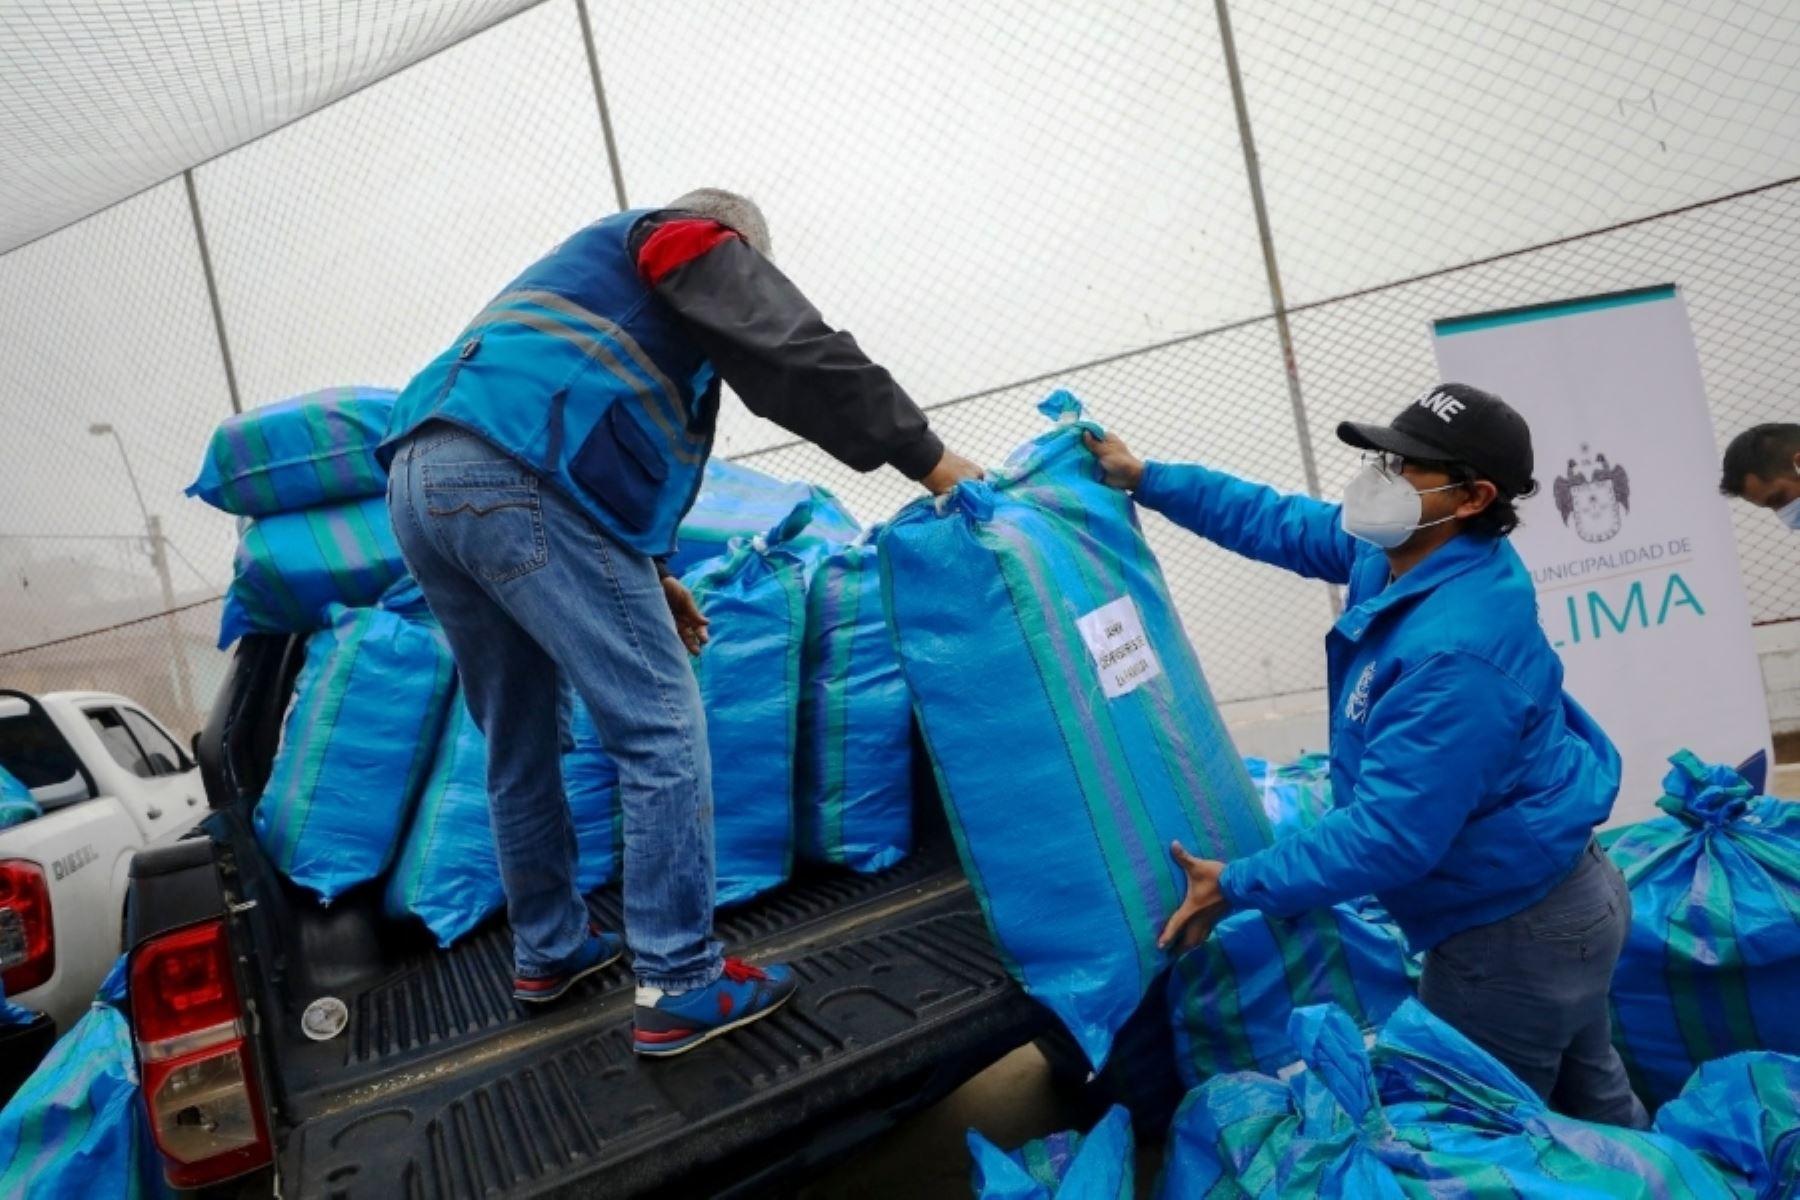 ¡Atención! Ofrecen 200 cupos para programa virtual sobre voluntariado municipal de Lima   Noticias